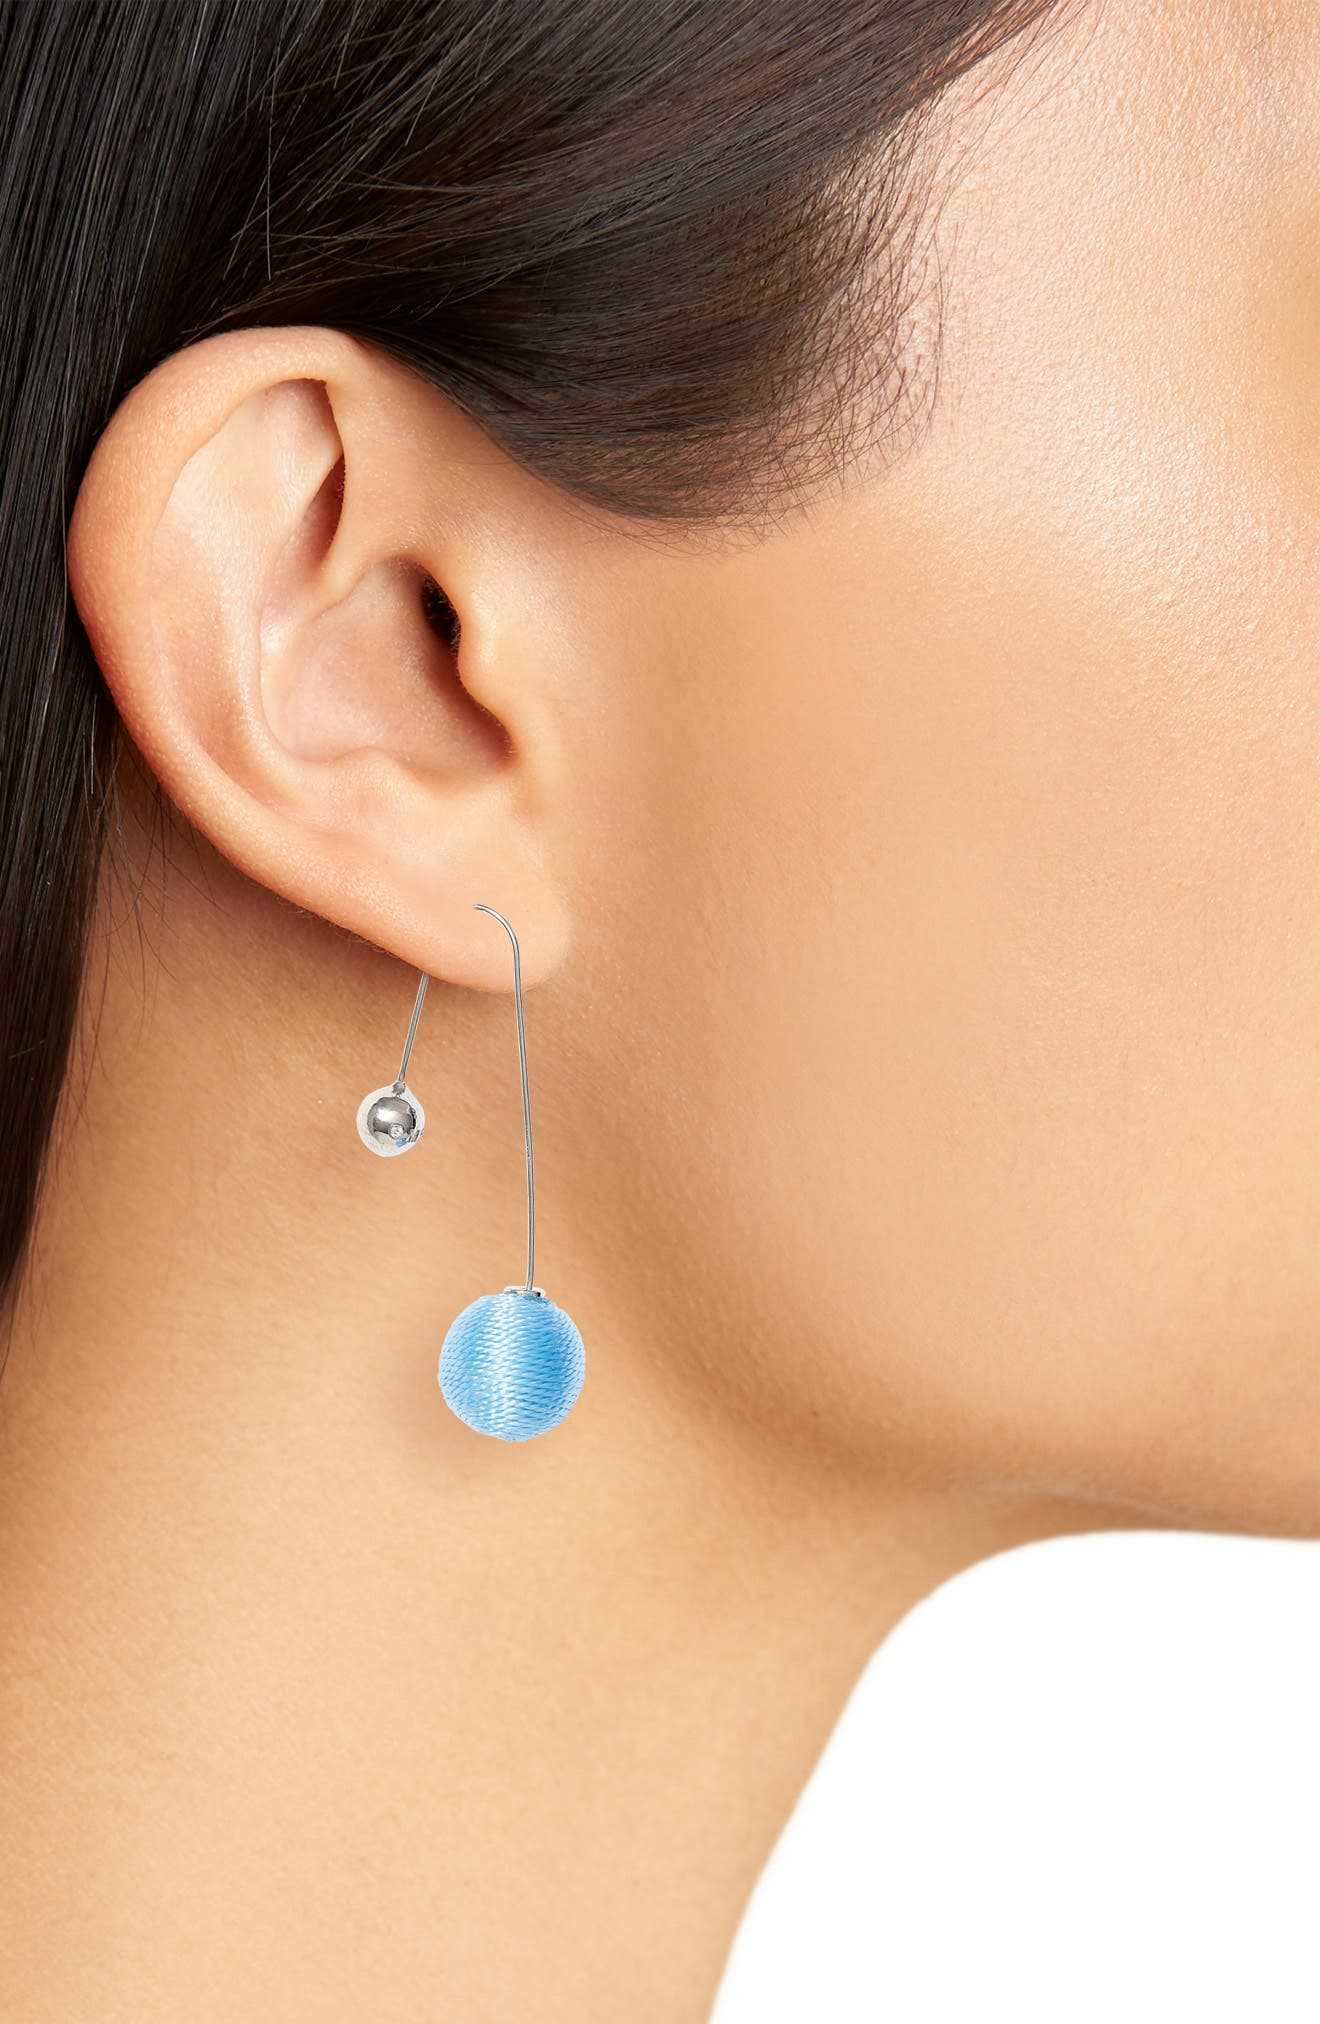 Contrast Sphere Threader Earrings,                             Alternate thumbnail 2, color,                             Blue/ Silver